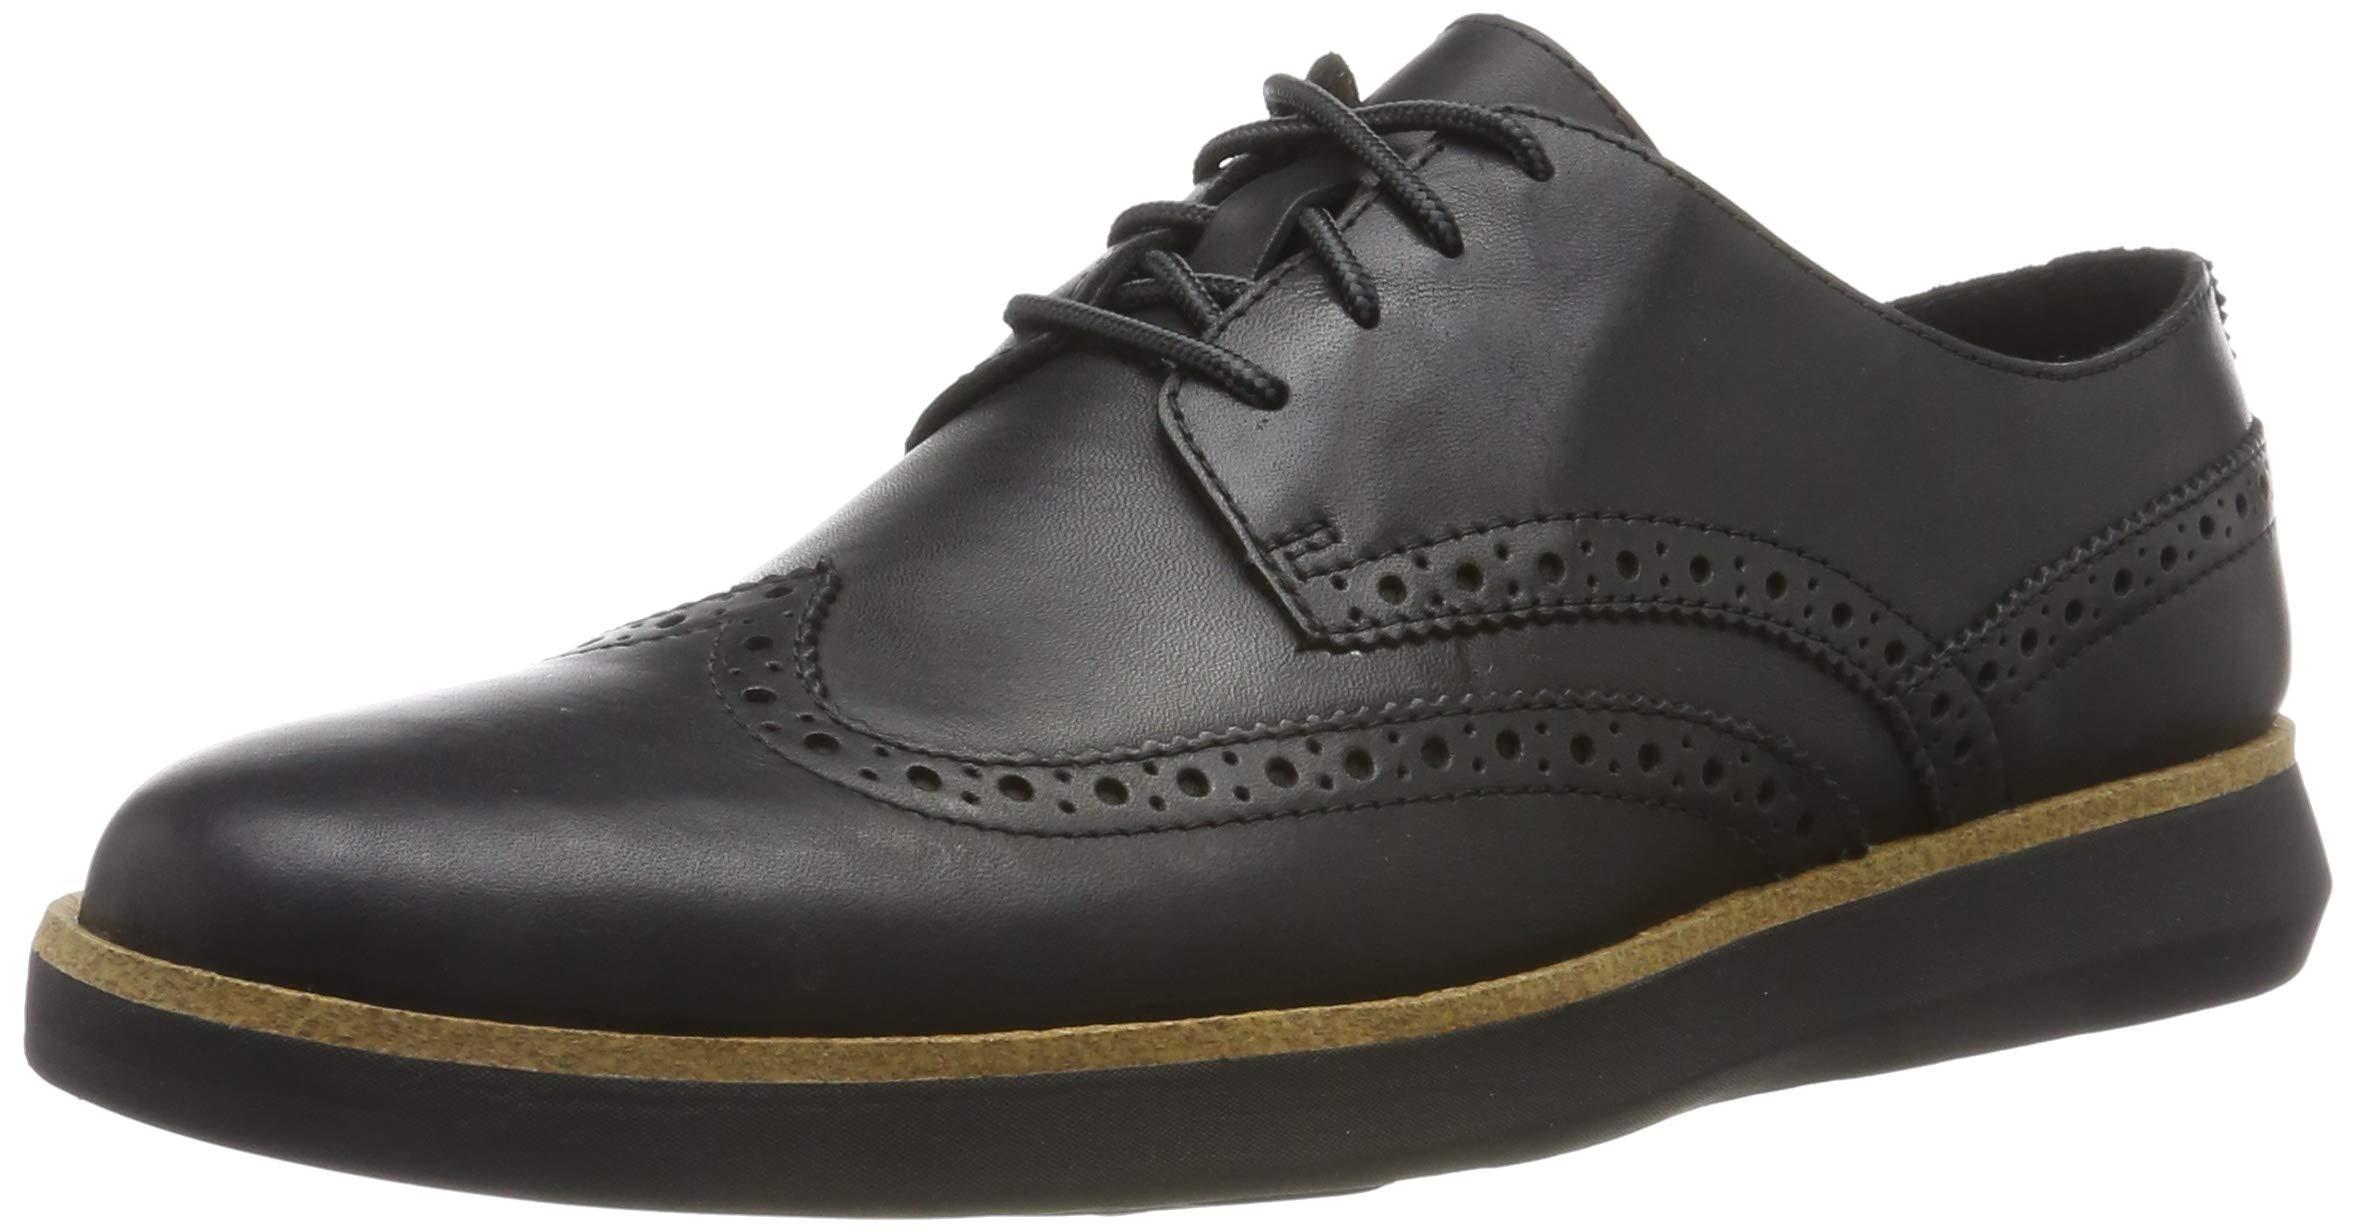 Fairford HommeNoir Black Leather43 Eu Clarks WalkBaskets 08nPkOw